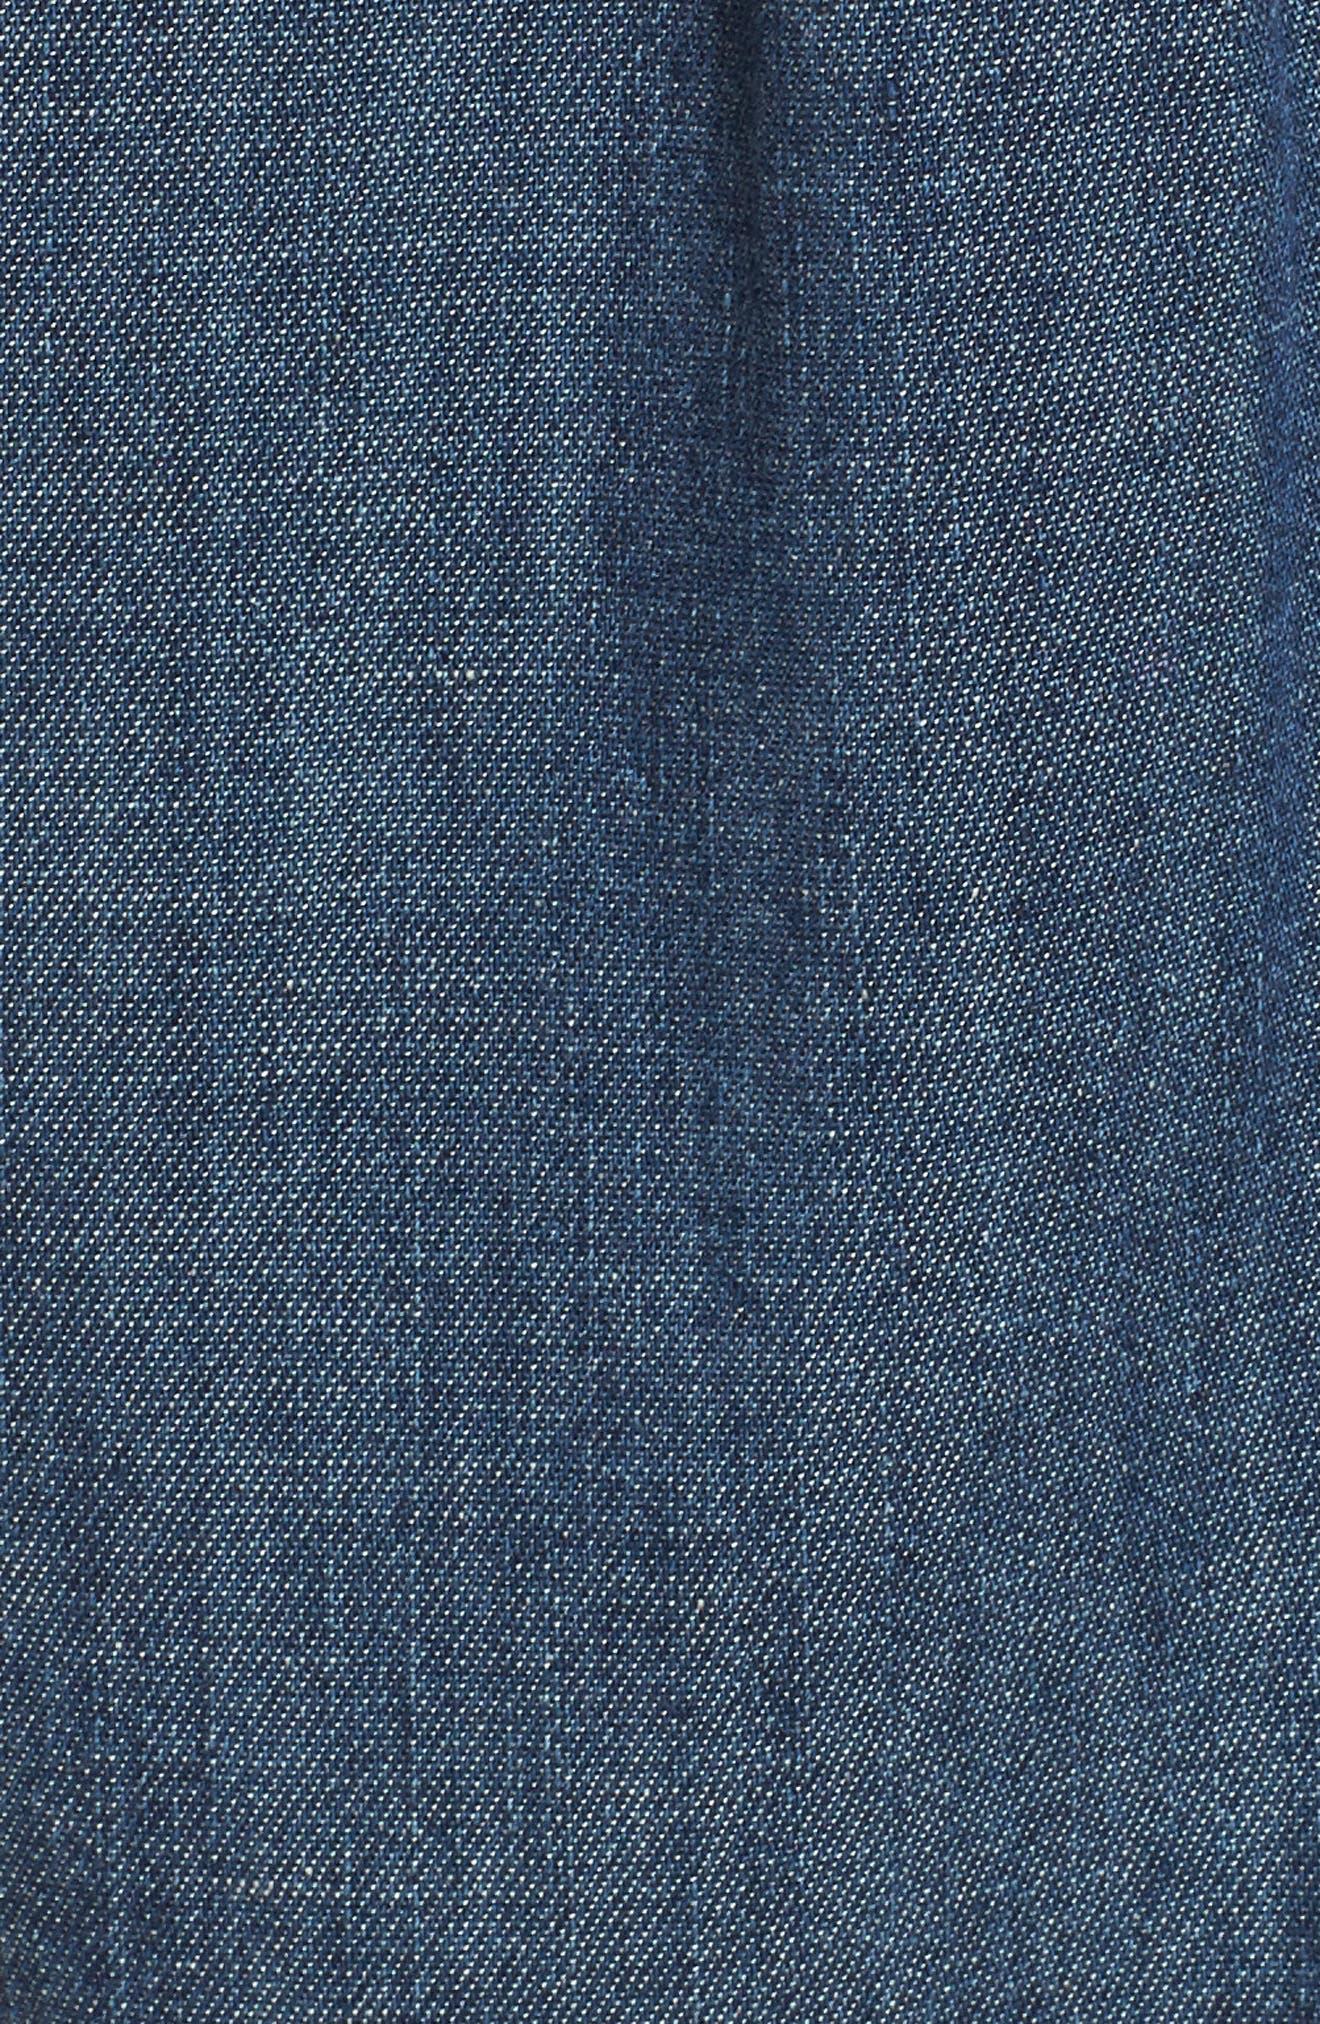 Alternate Image 5  - AG Joanna Embroidered Denim Shirt